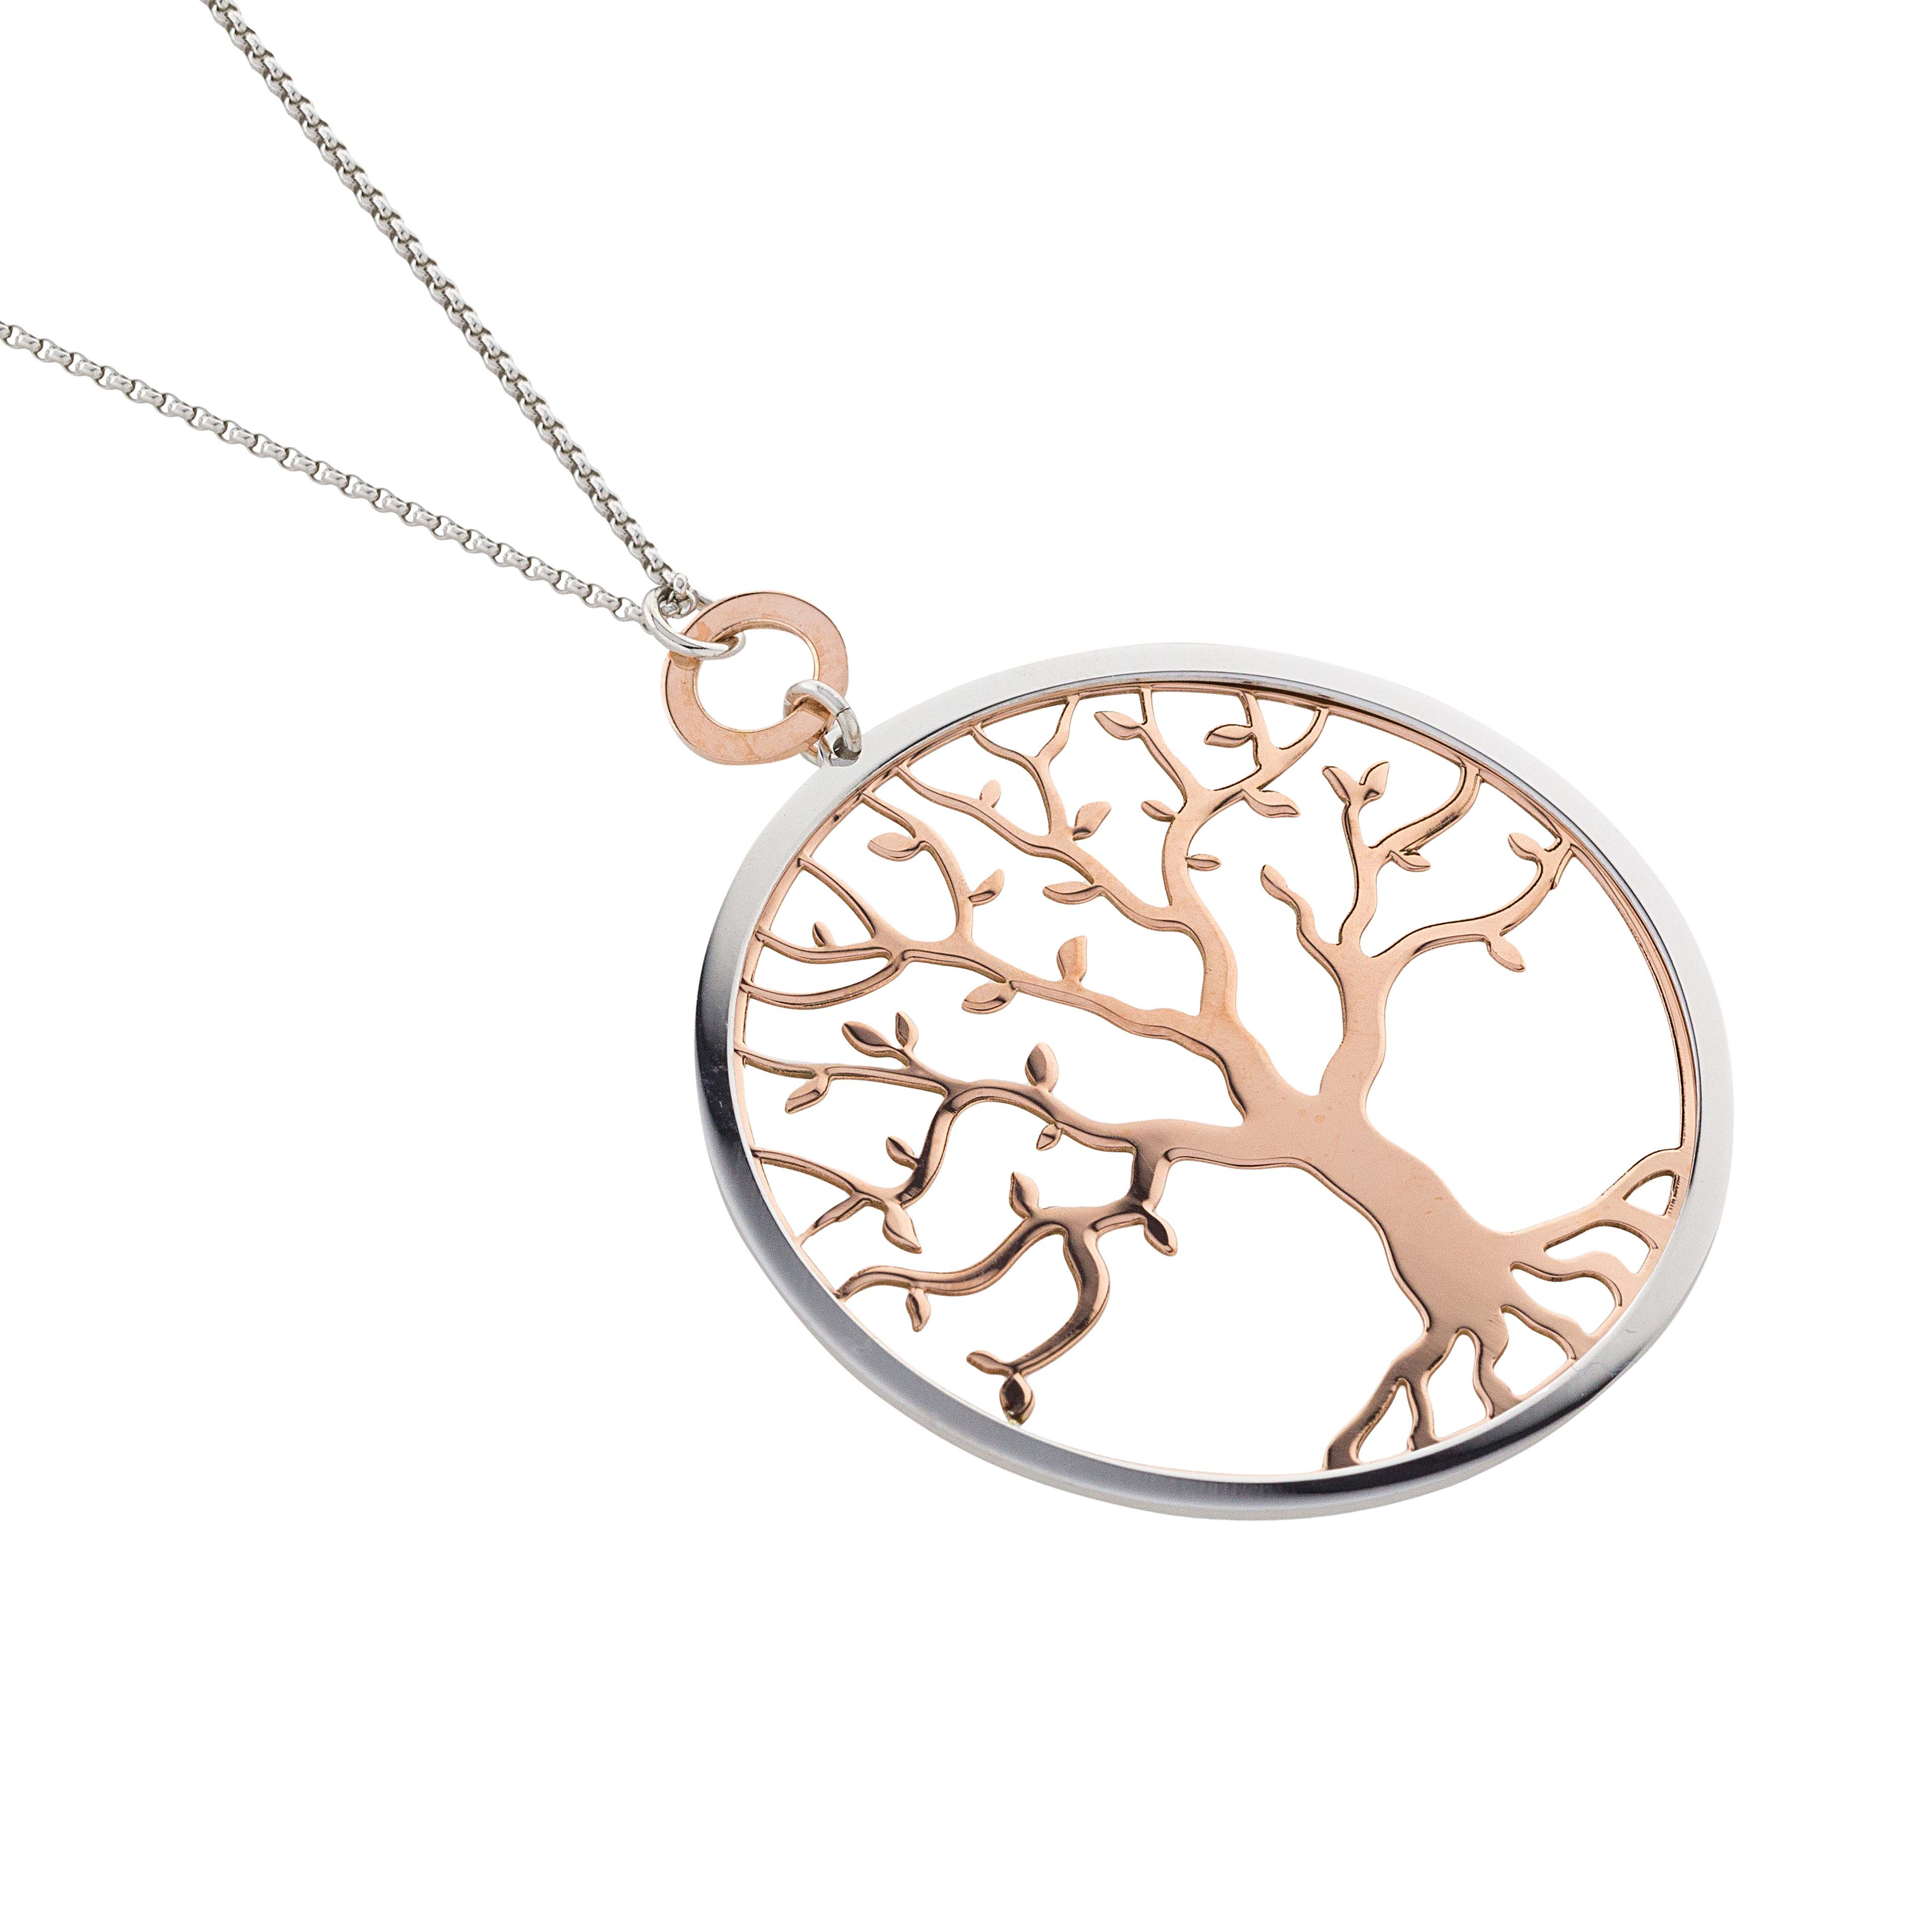 8a480ff643f7 Collar gargantilla plata arbol de la vida bicolor-Joyeria Vila